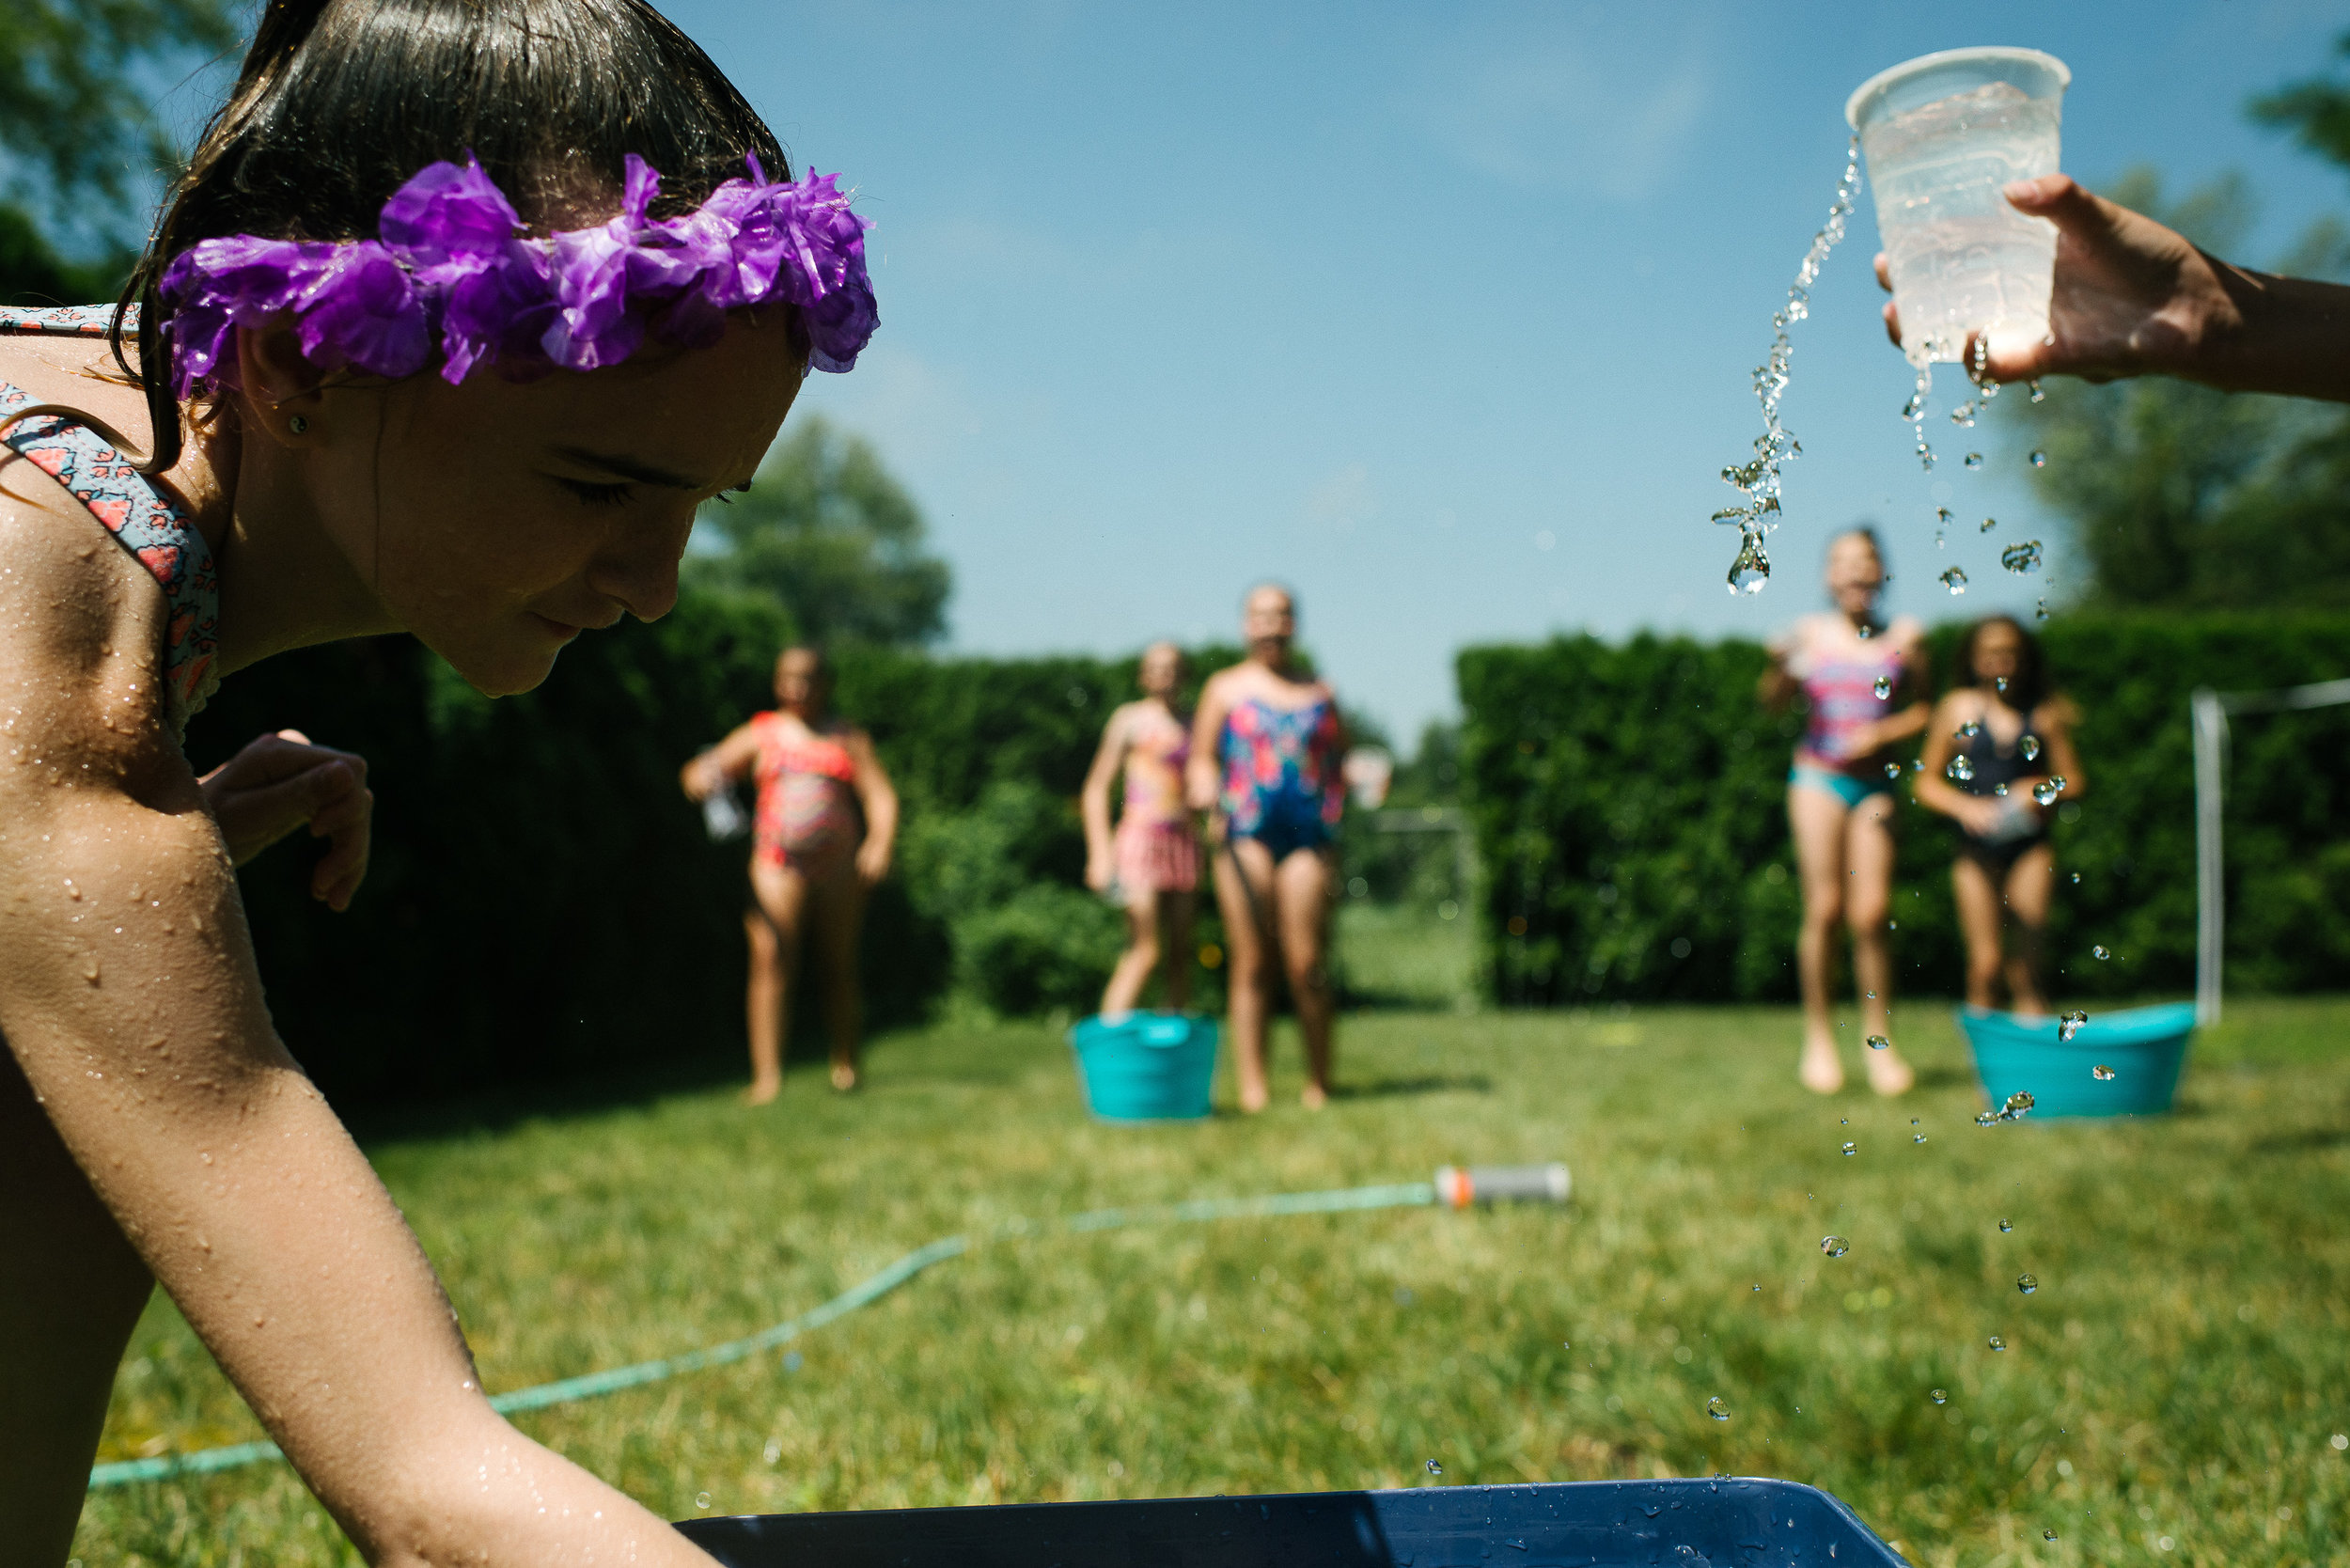 girl birthday party photography kingston-142825vm.jpg